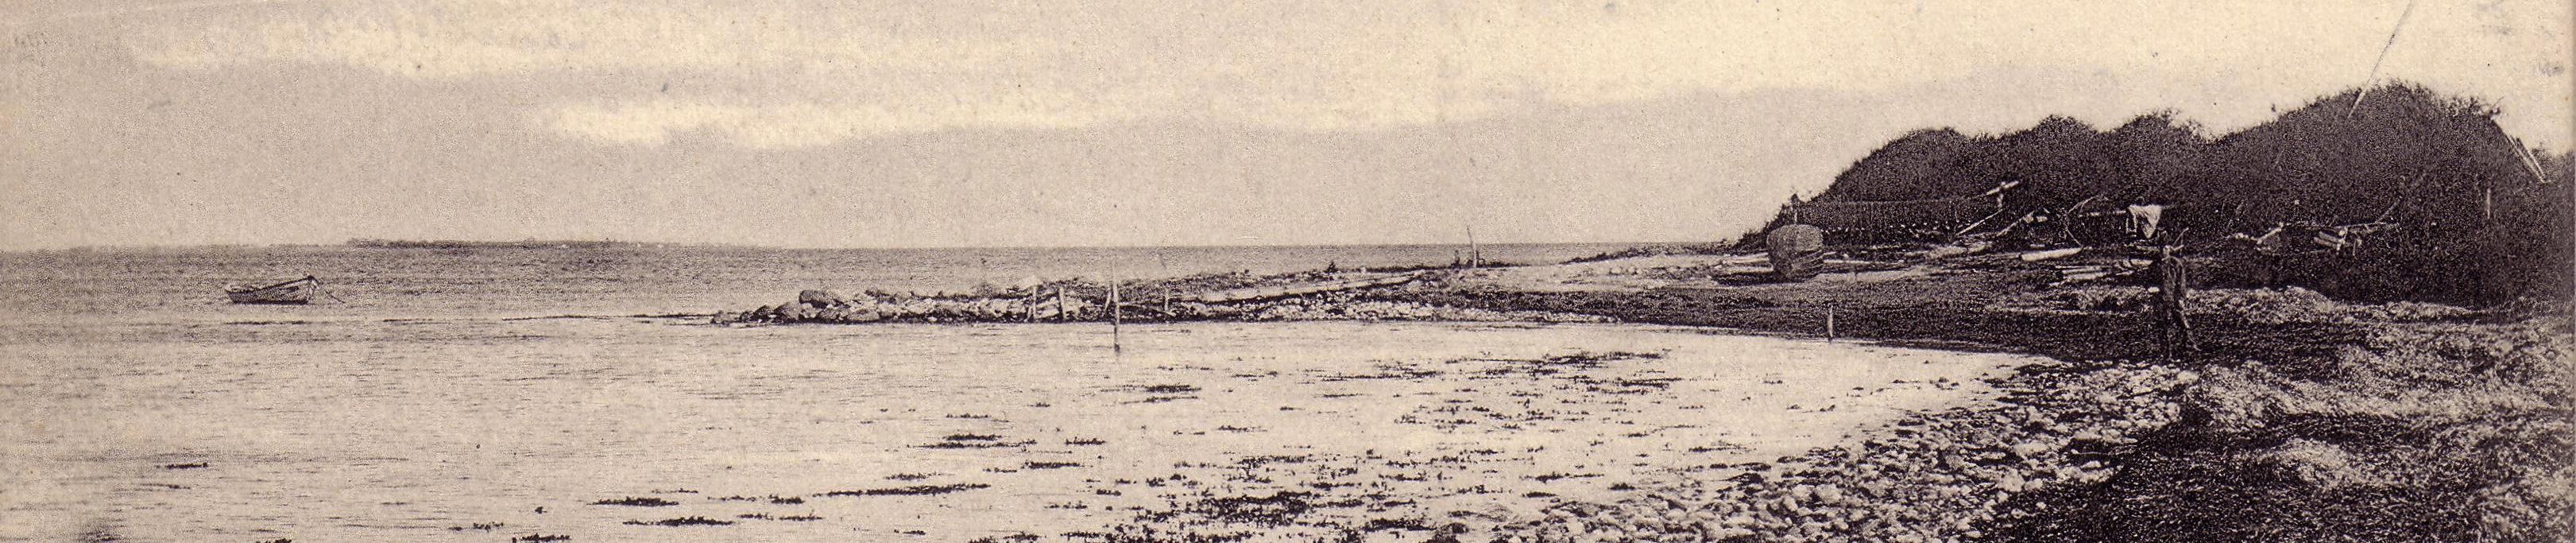 Vesterby havn